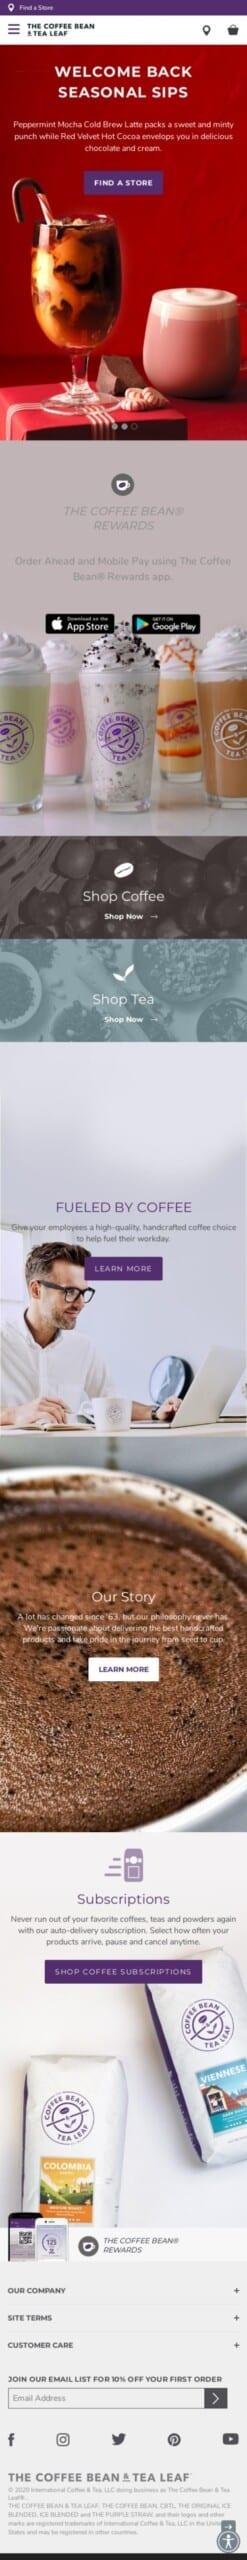 Coffee Bean & Tea Leaf - Dynamic Coupon